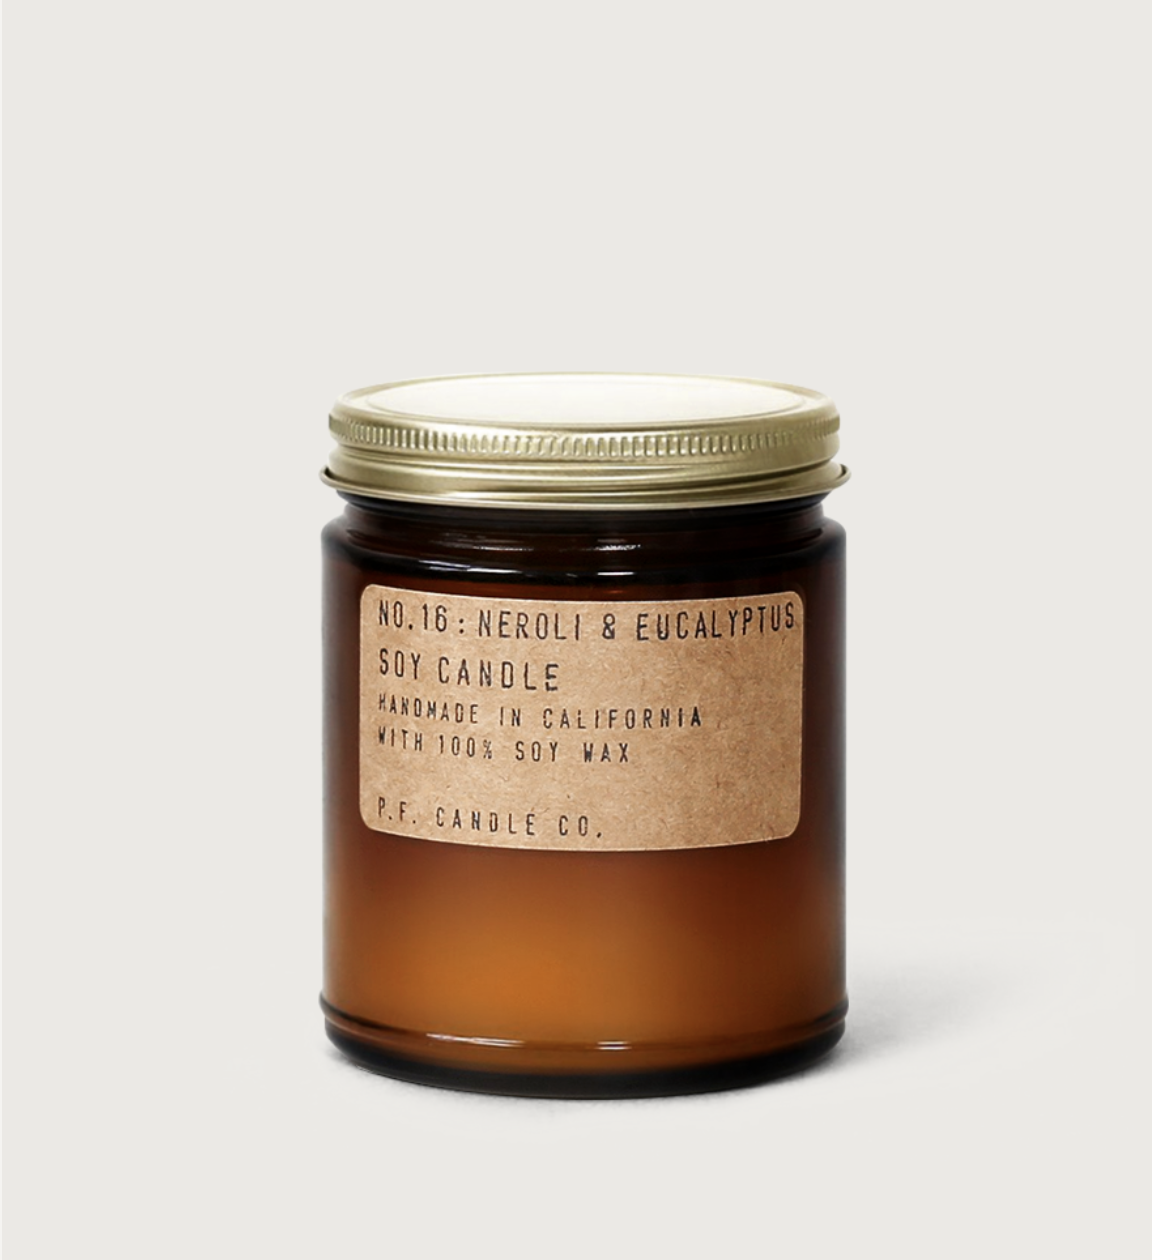 P.F. Candle Co. Neroli + Eucalyptus